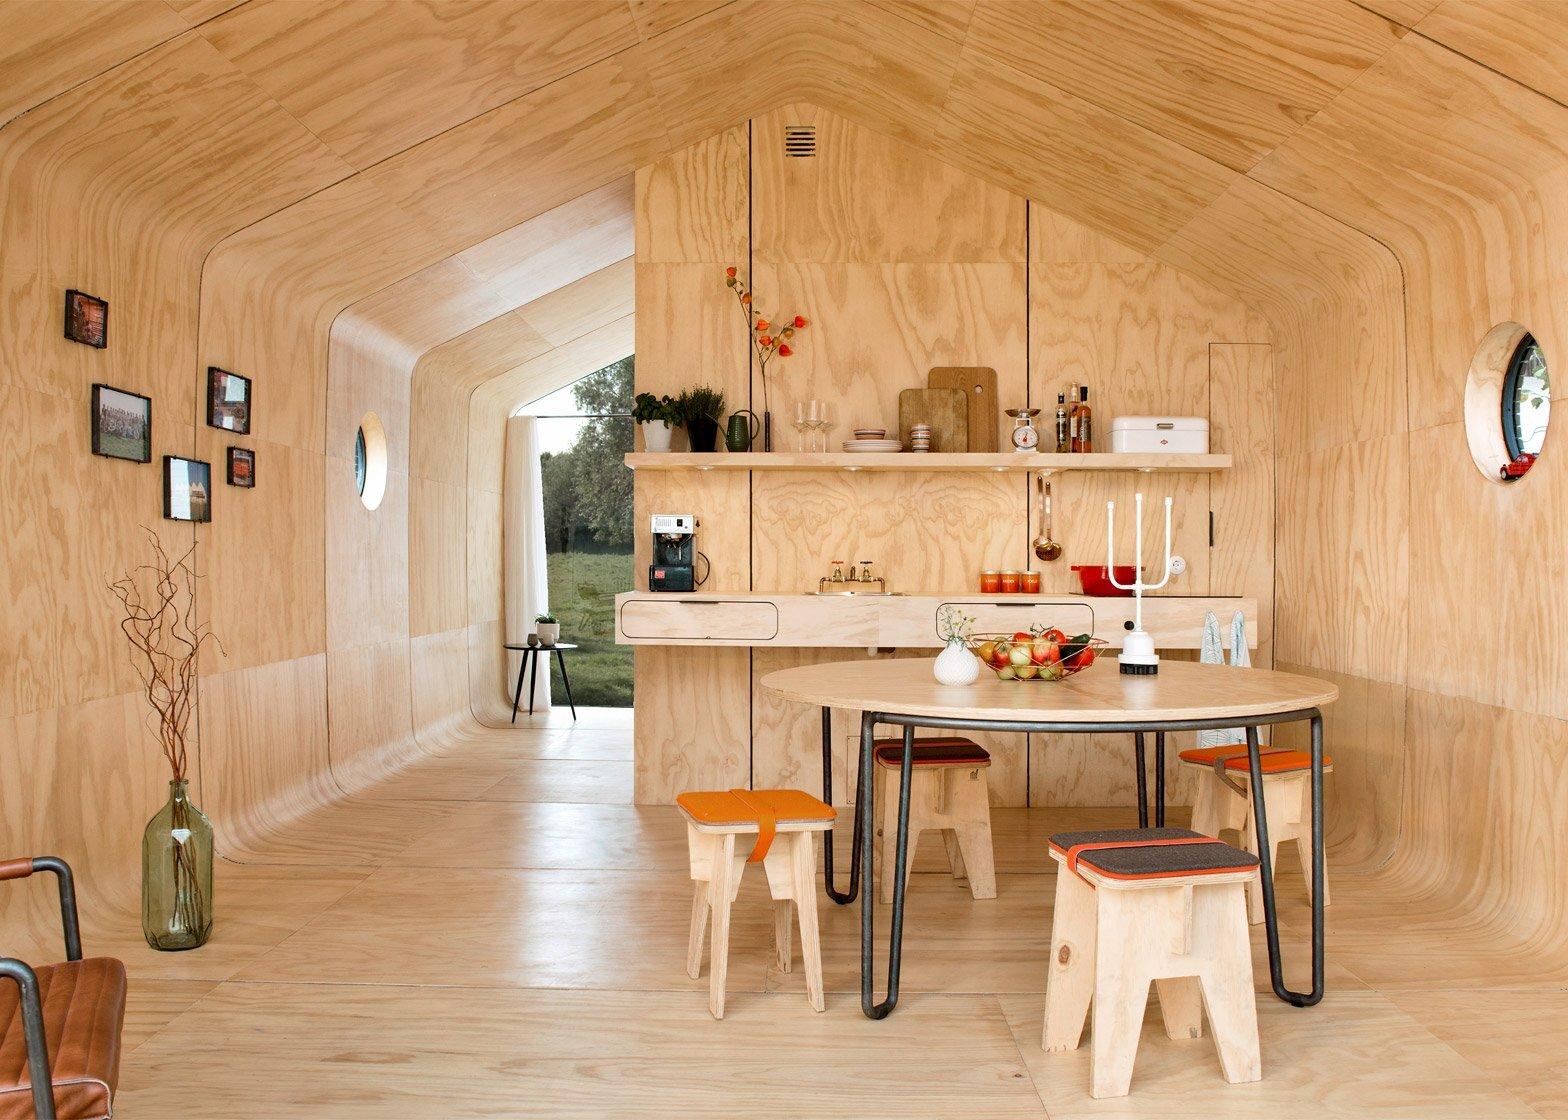 Wikkelhouse a prefab modular home made of cardboard